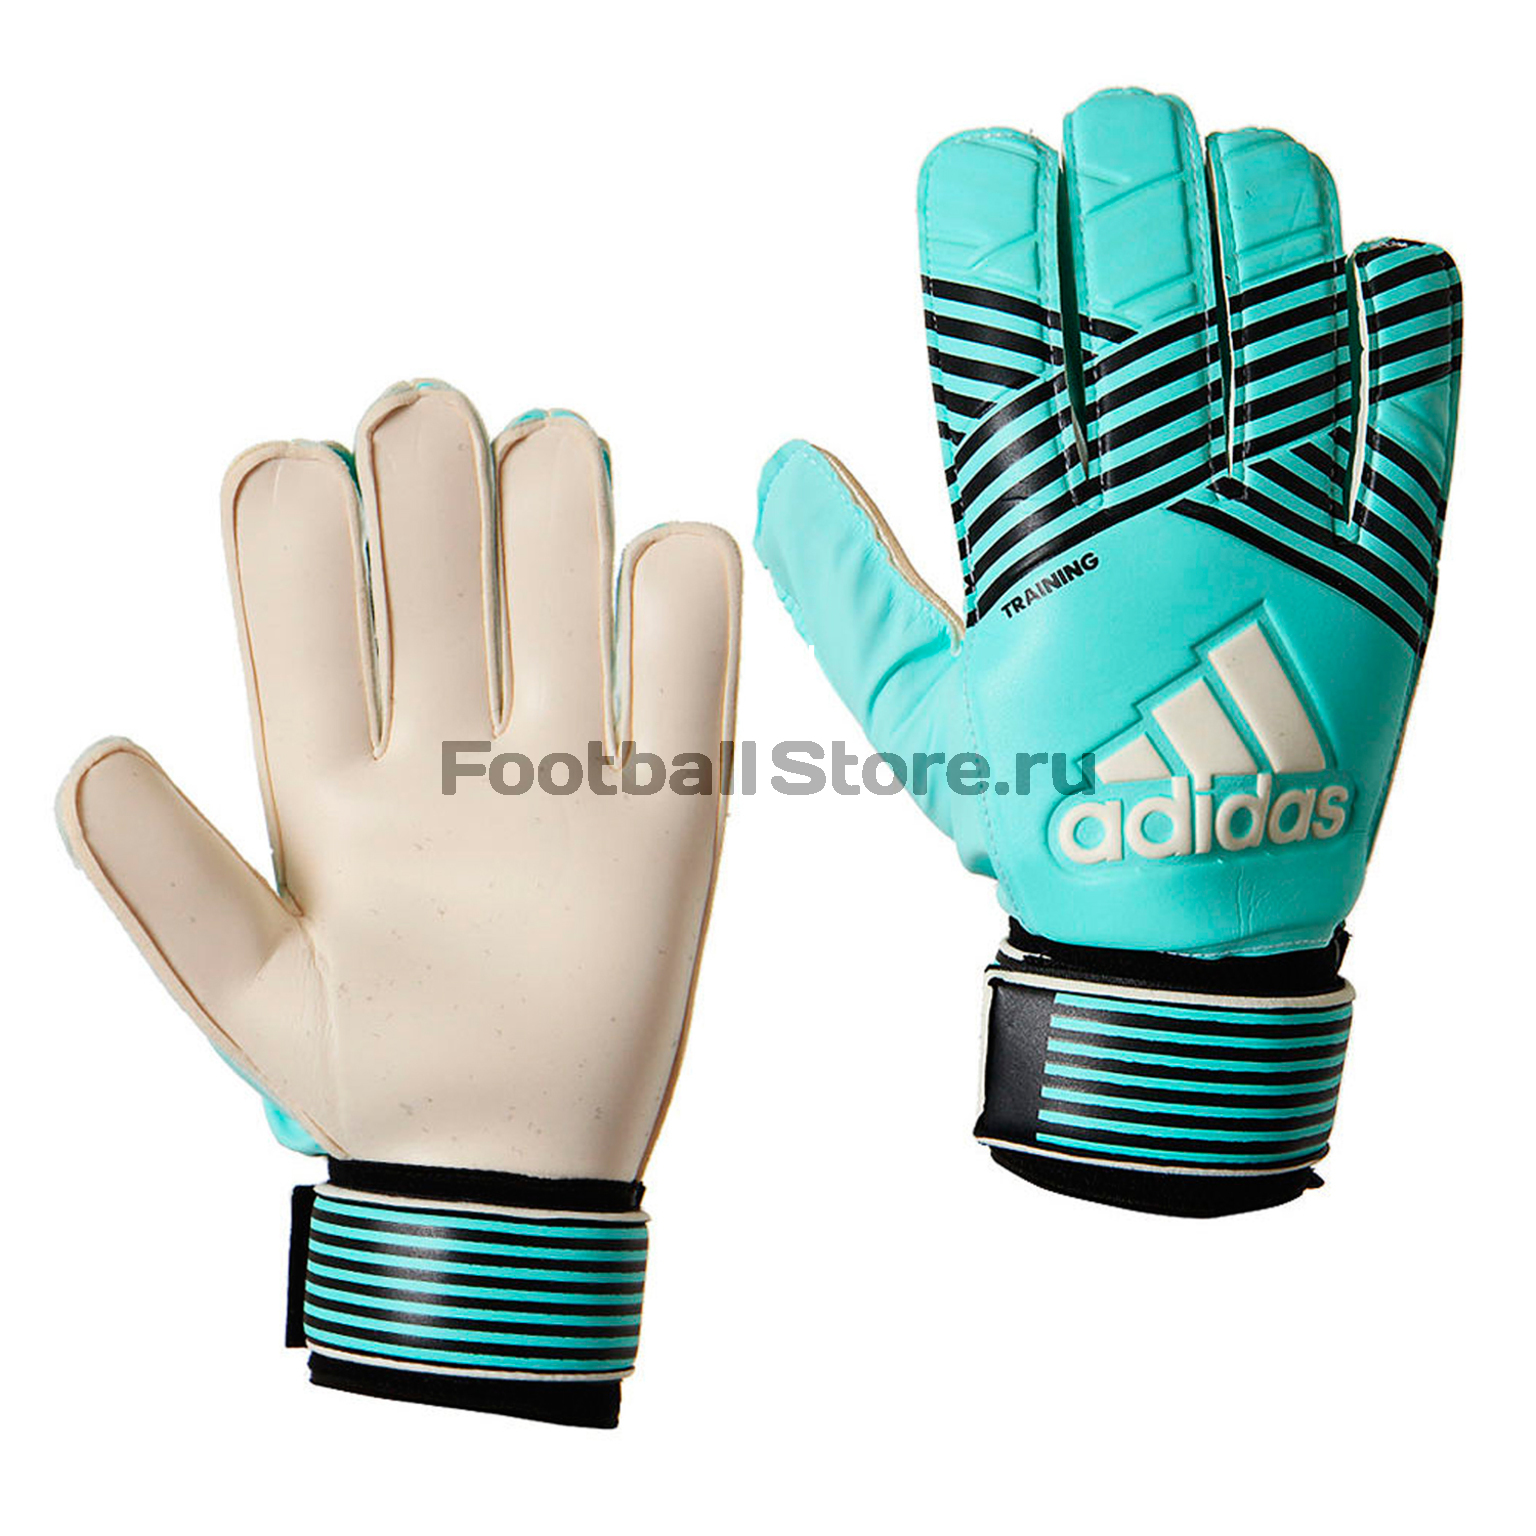 Перчатки вратарские Adidas Ace Training BQ4588 перчатки вратарские adidas ace half neg az3688